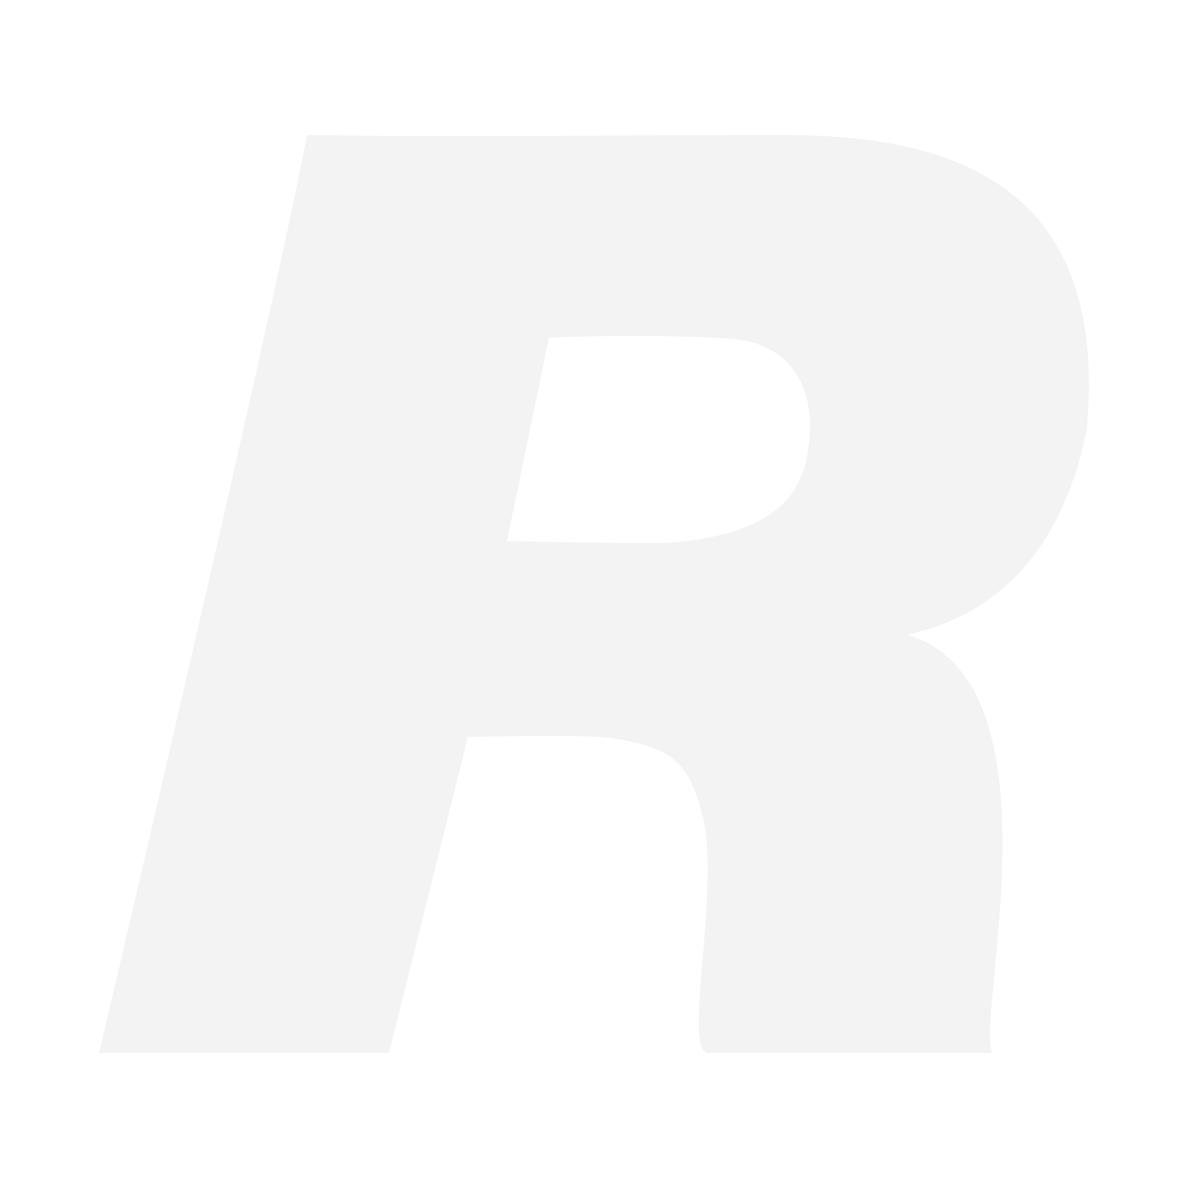 26169 ELINCHROM White Softlite 82° 70 cm (incl. 26310)